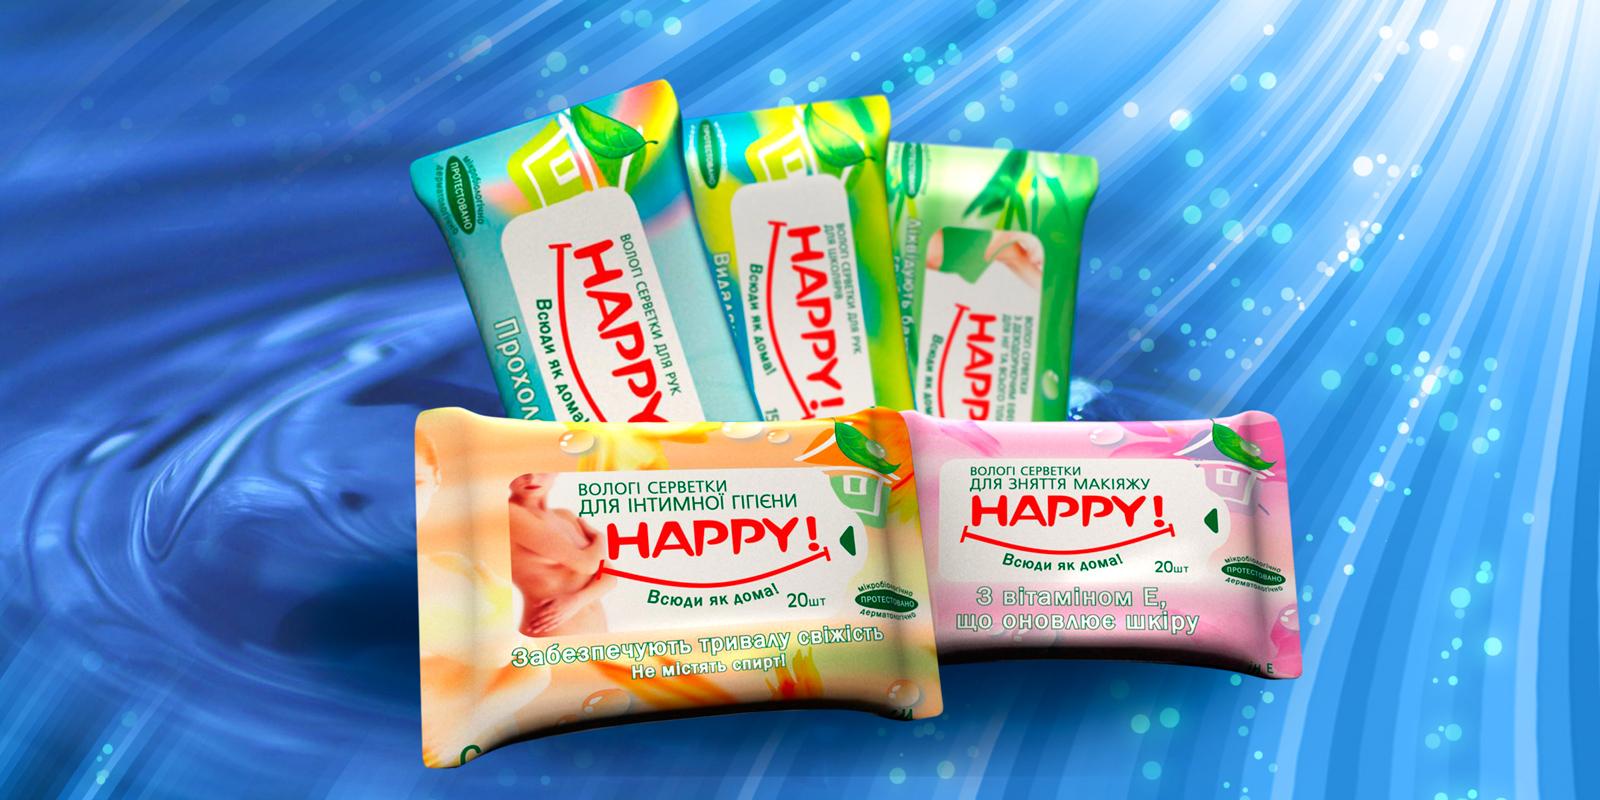 TM Happy!;;;;;;Разработка упаковки;;;;;;<span>Клиент:</span> TM Happy!;;;;;;;;;;;;Разработка упаковки;;;;;; 2 ;;;;;;